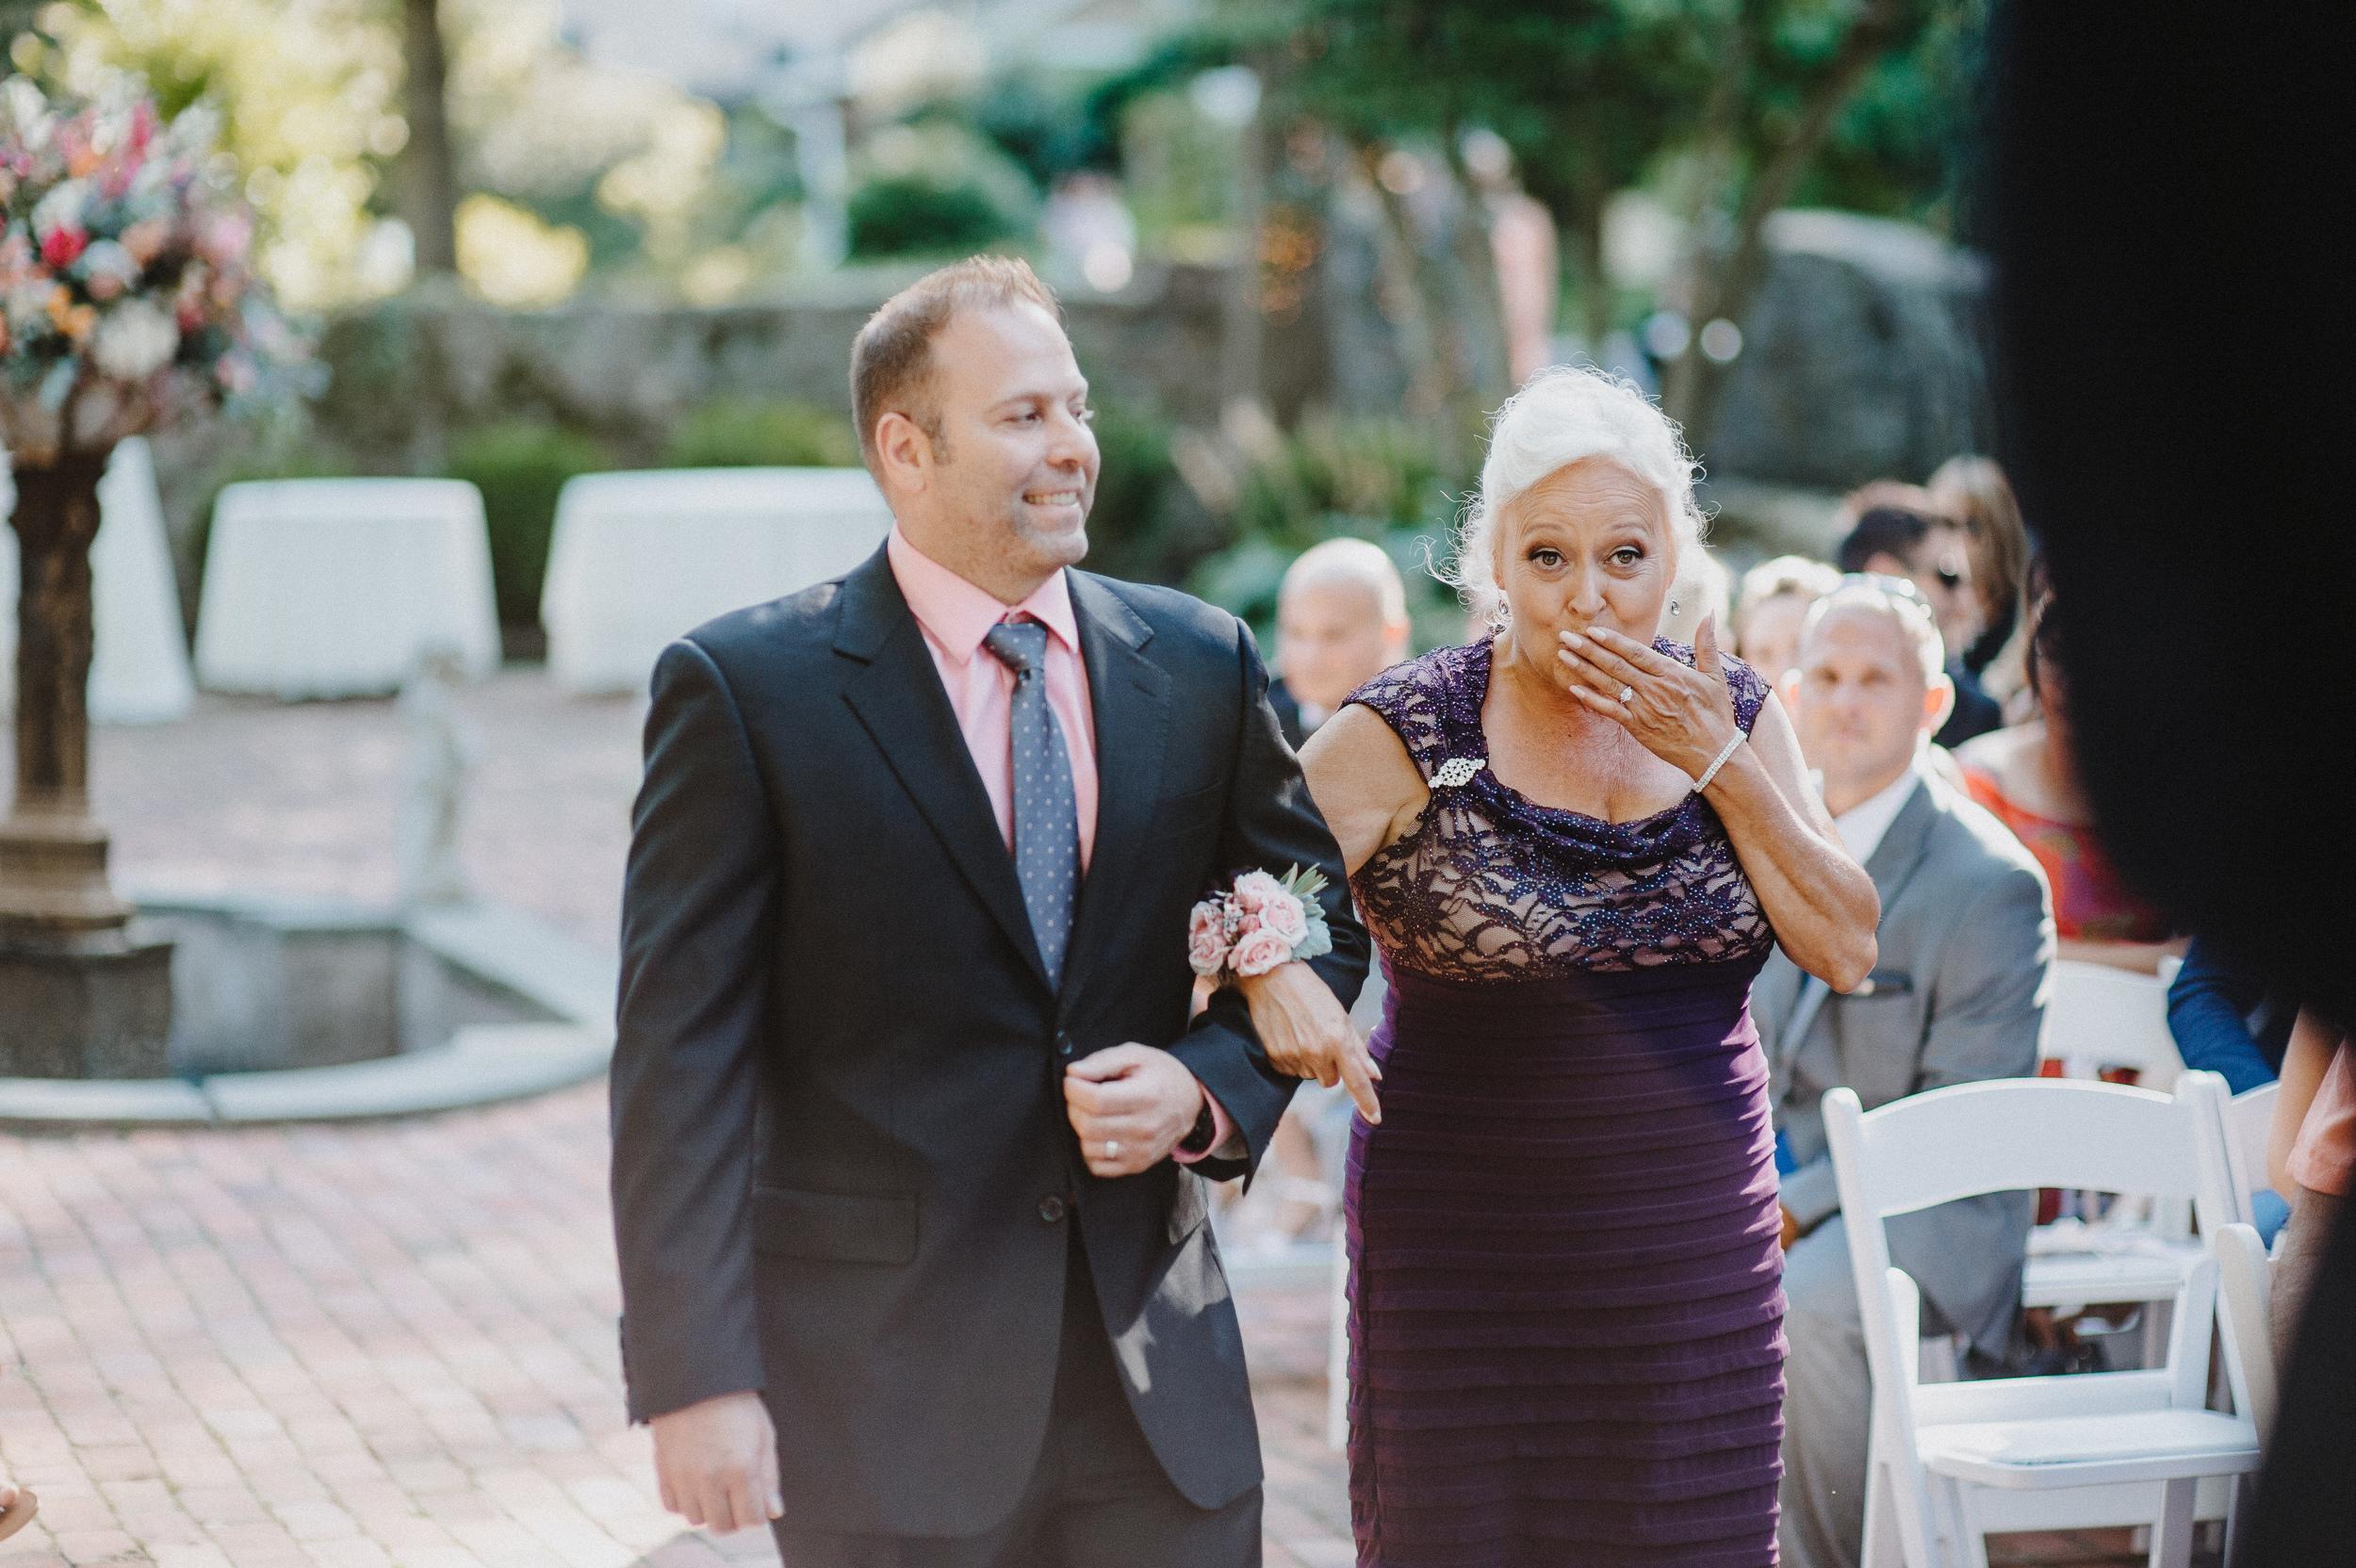 holly-hedge-estate-wedding-photographer-pat-robinson-photography-51.jpg